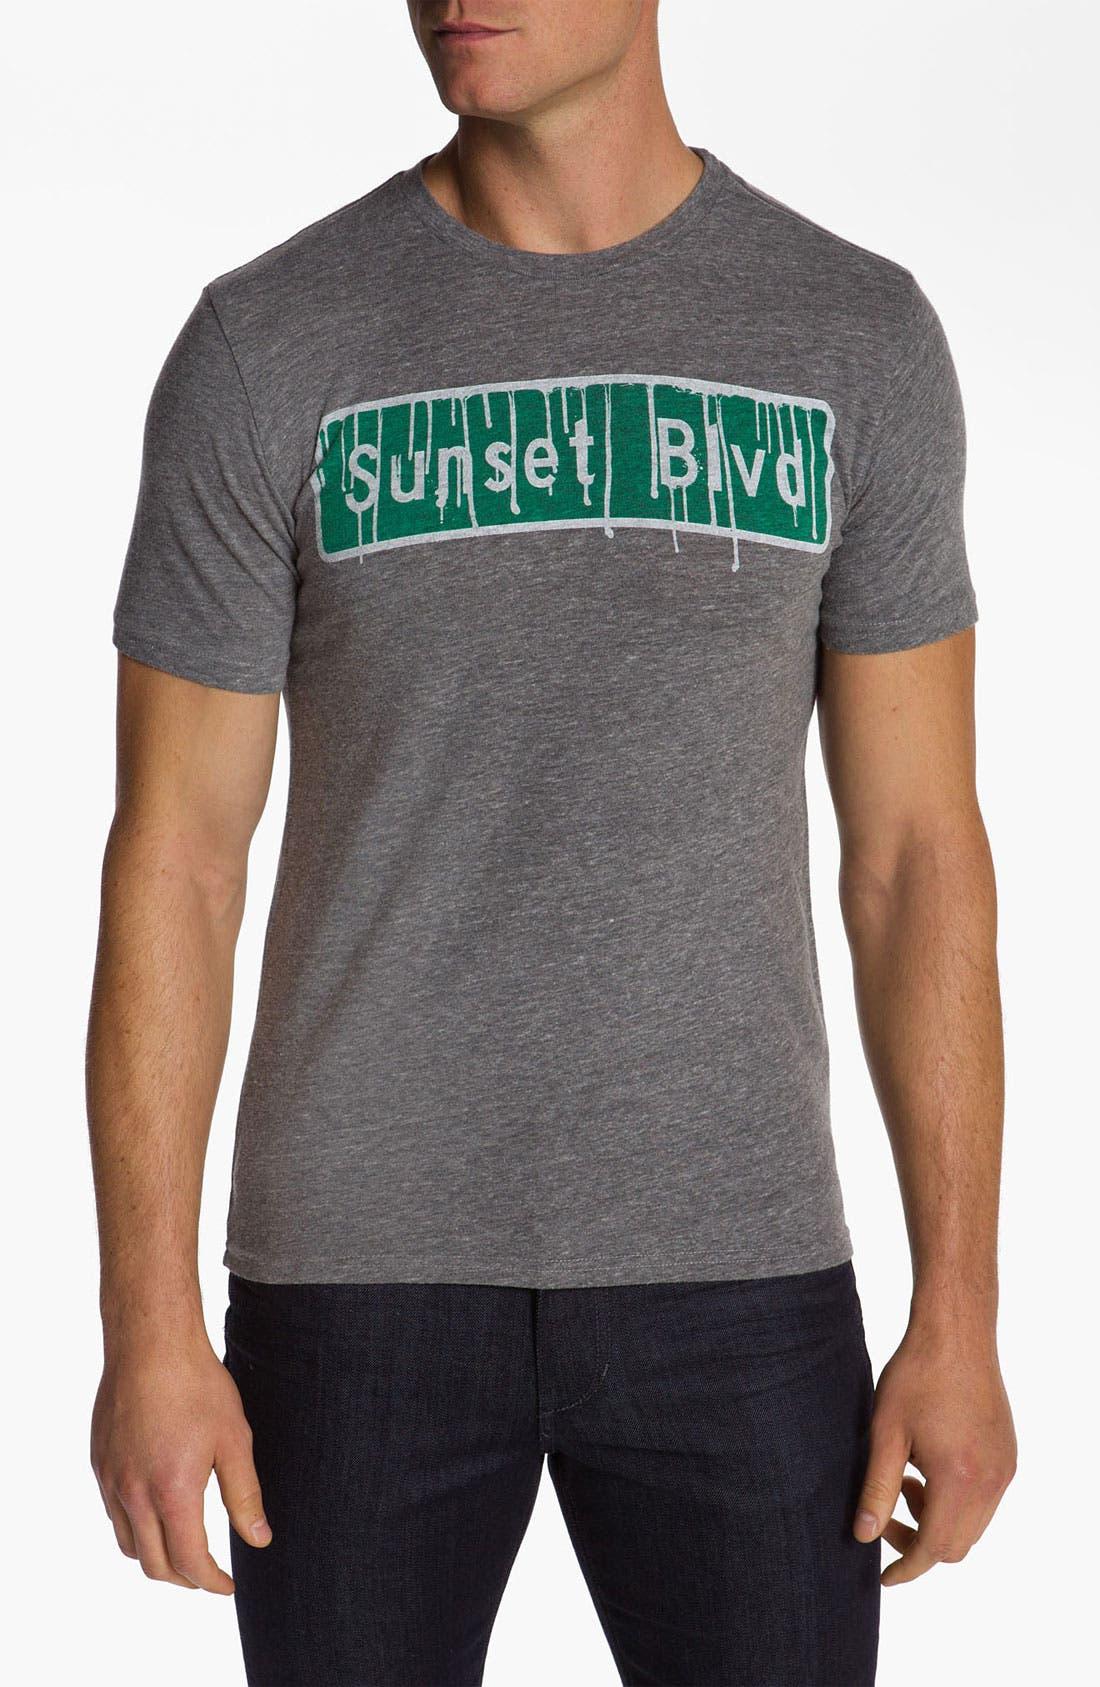 Main Image - Chaser 'Sunset Blvd' T-Shirt